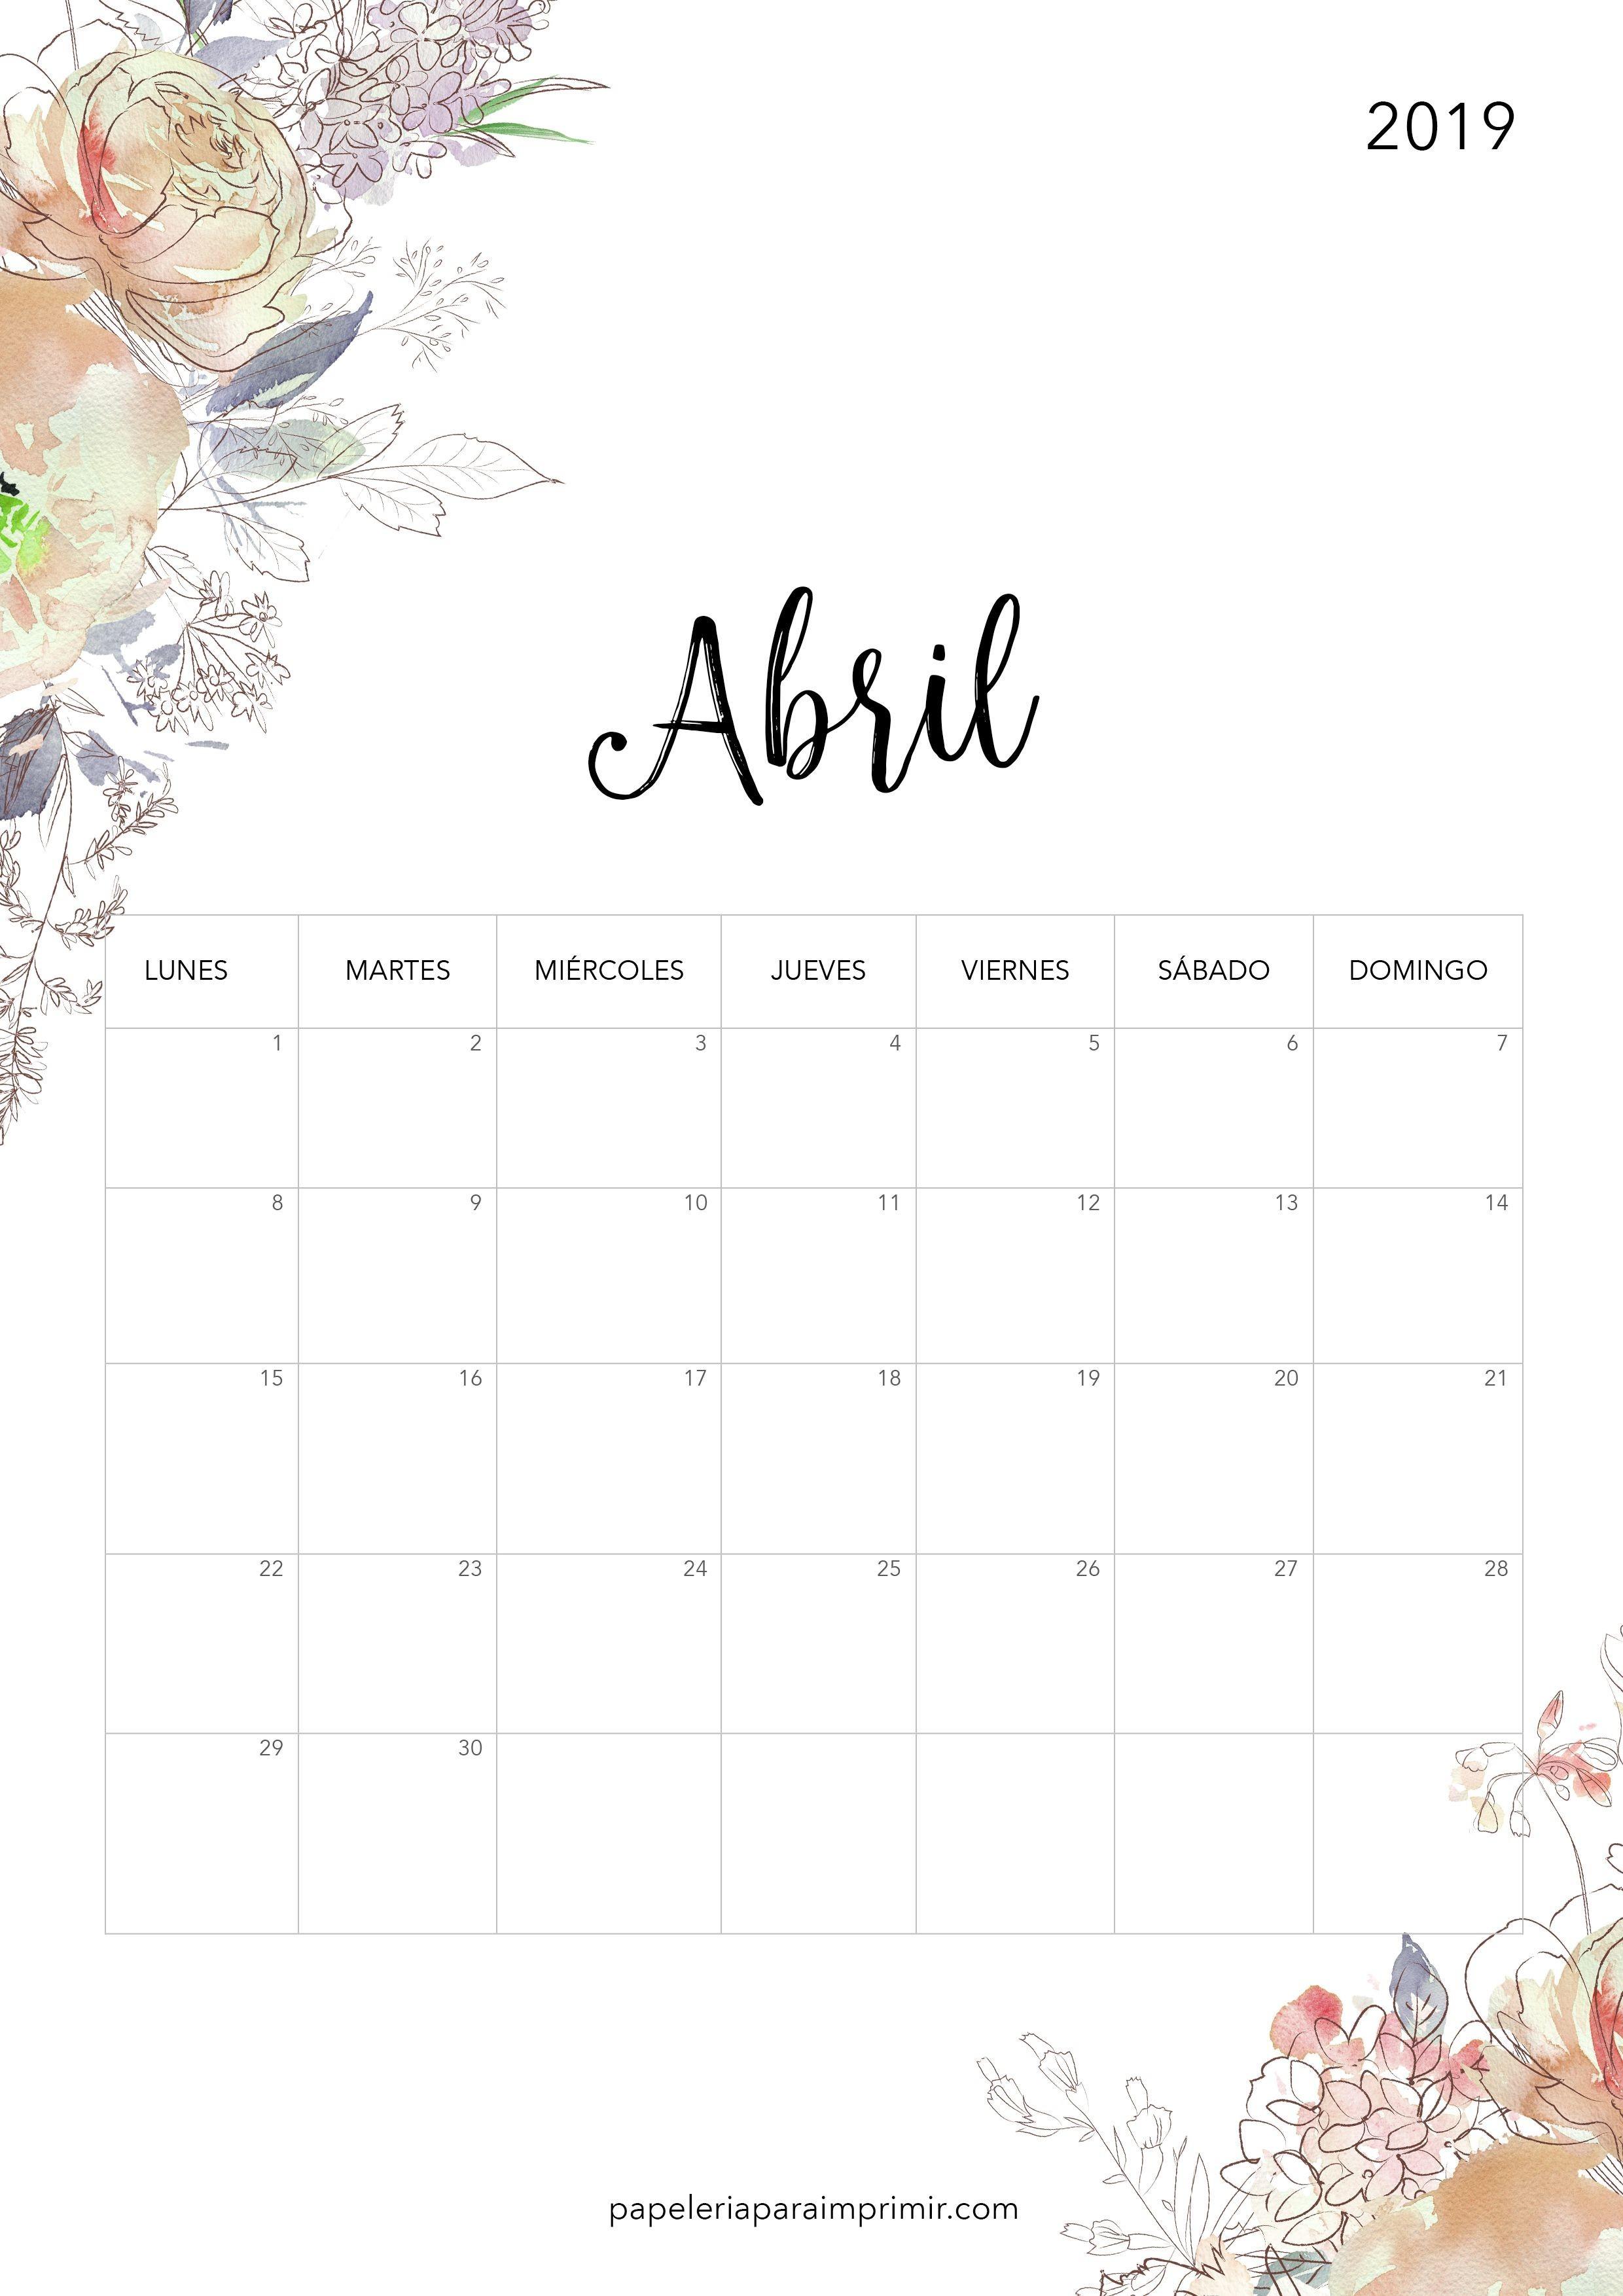 Calendario para imprimir 2019 Abril calendario imprimir printable freebie bonito